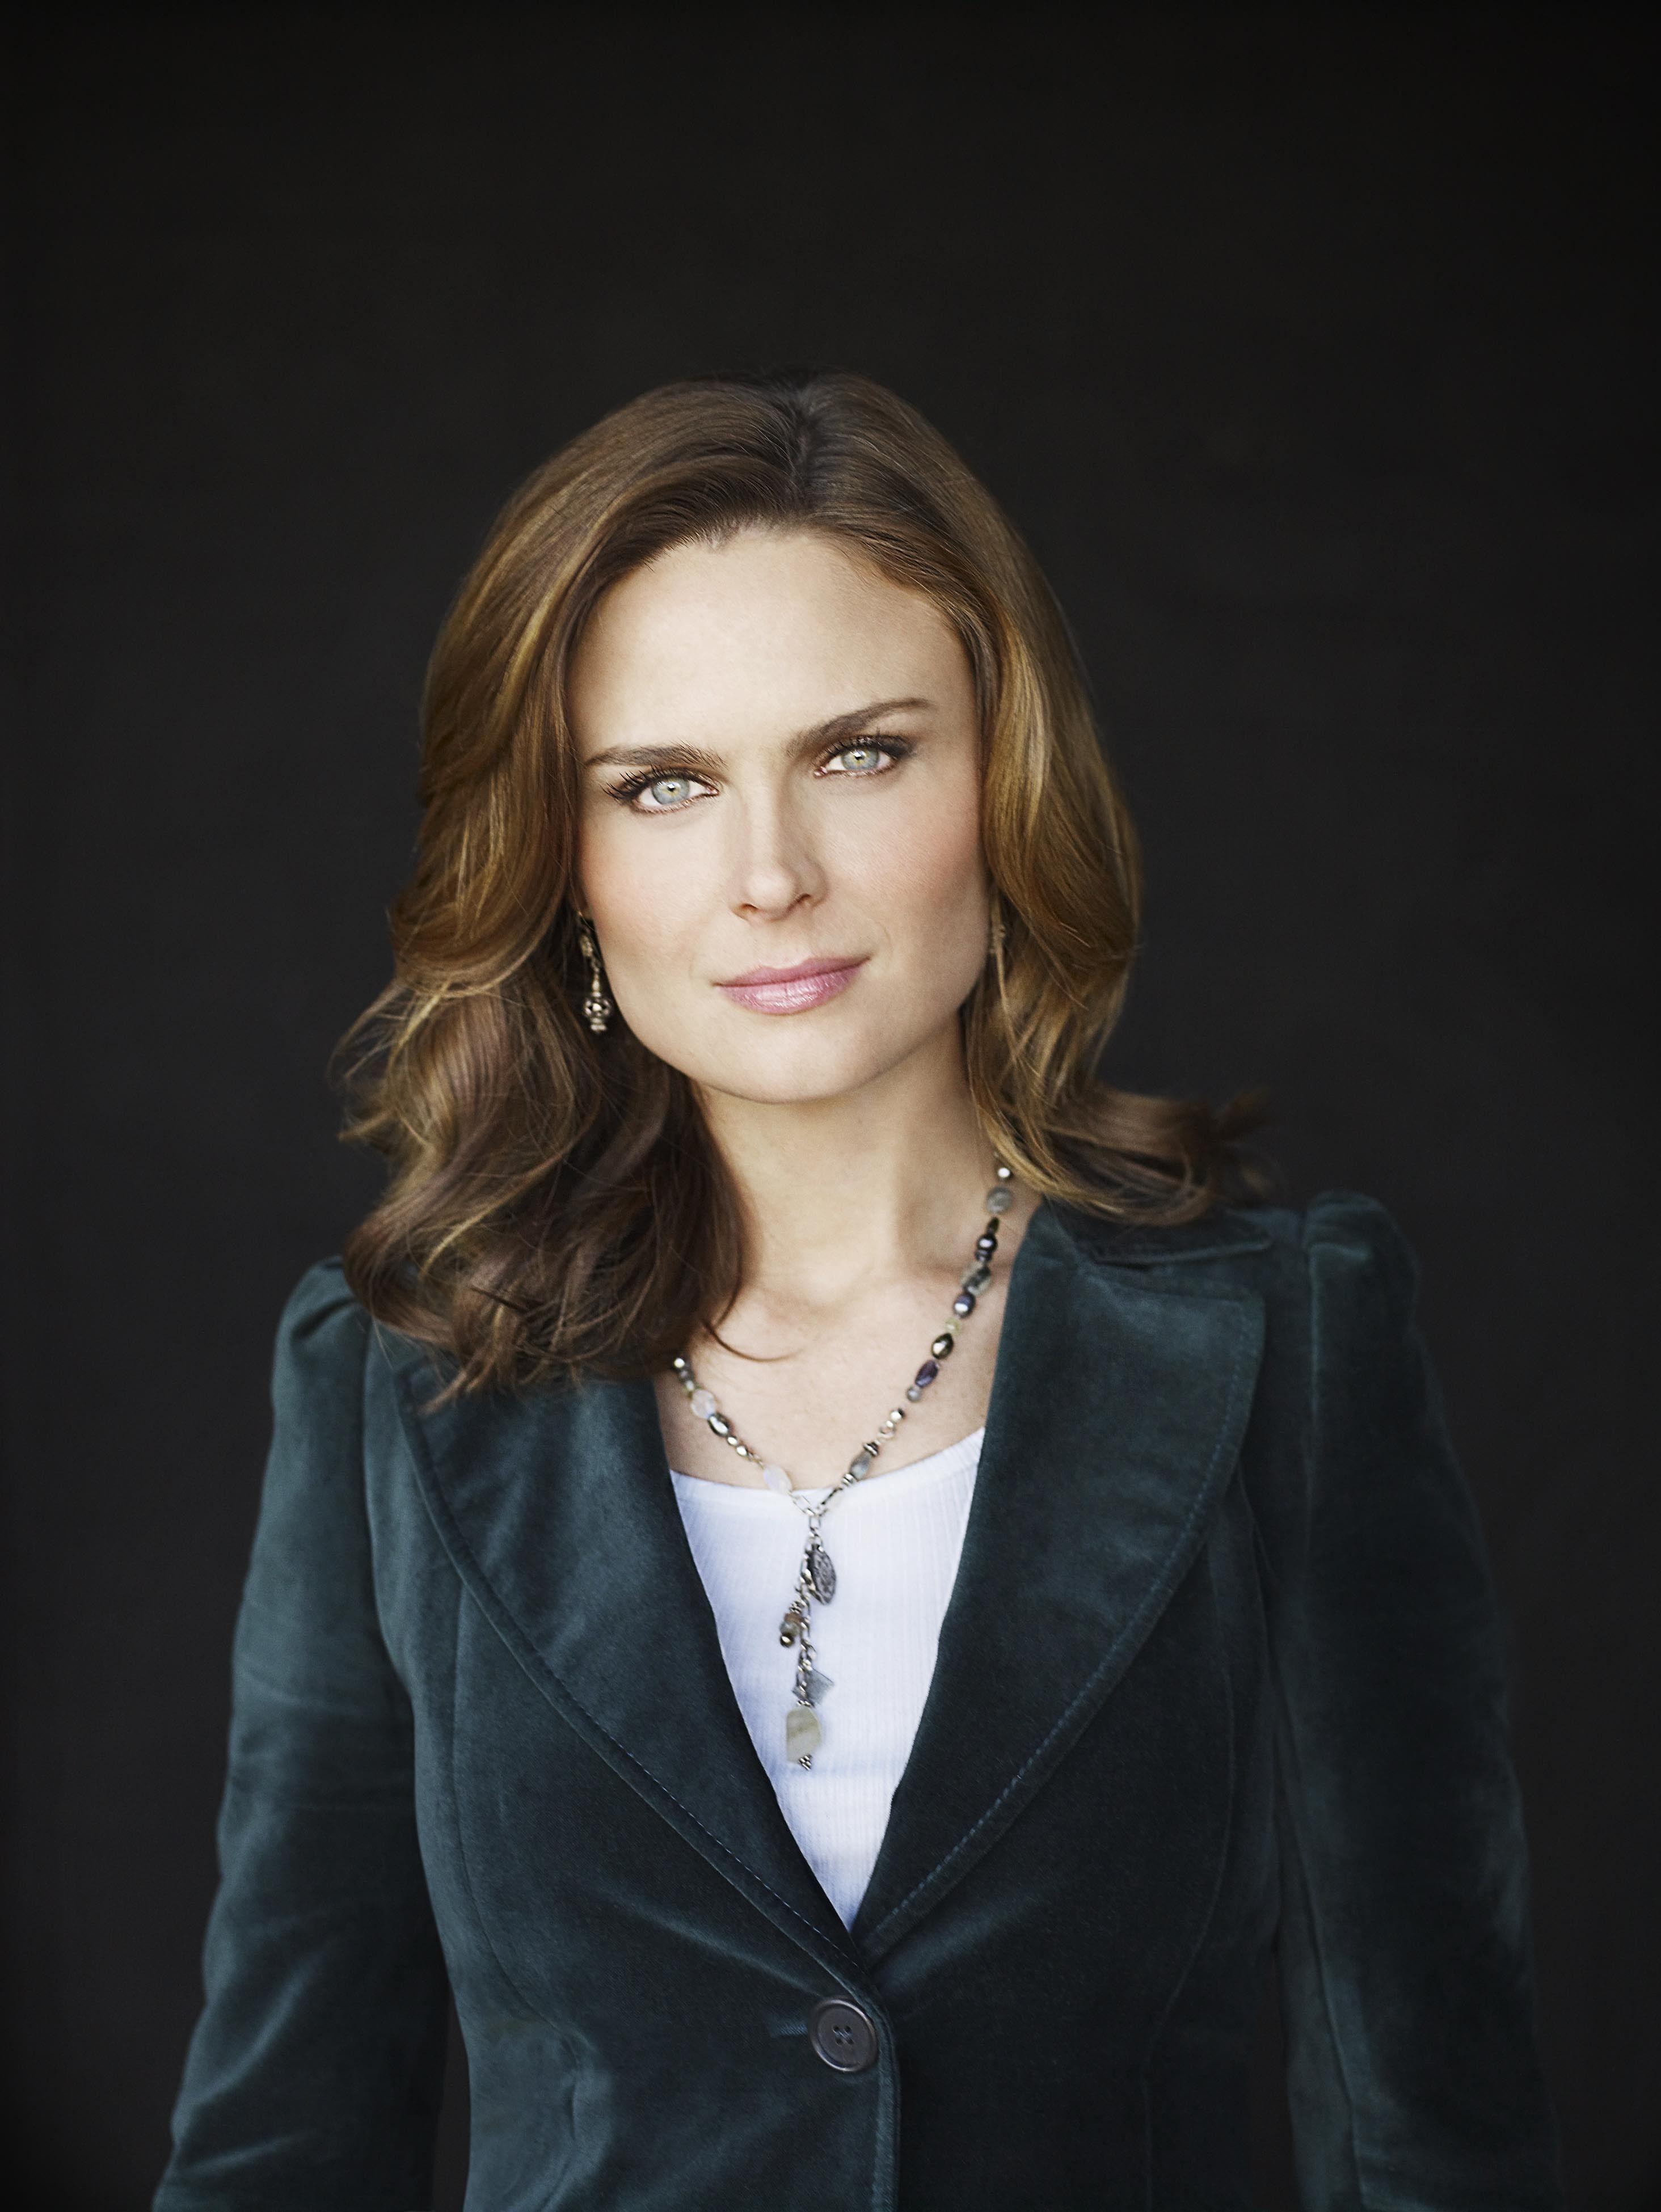 Bones S5 Emily Deschanel as